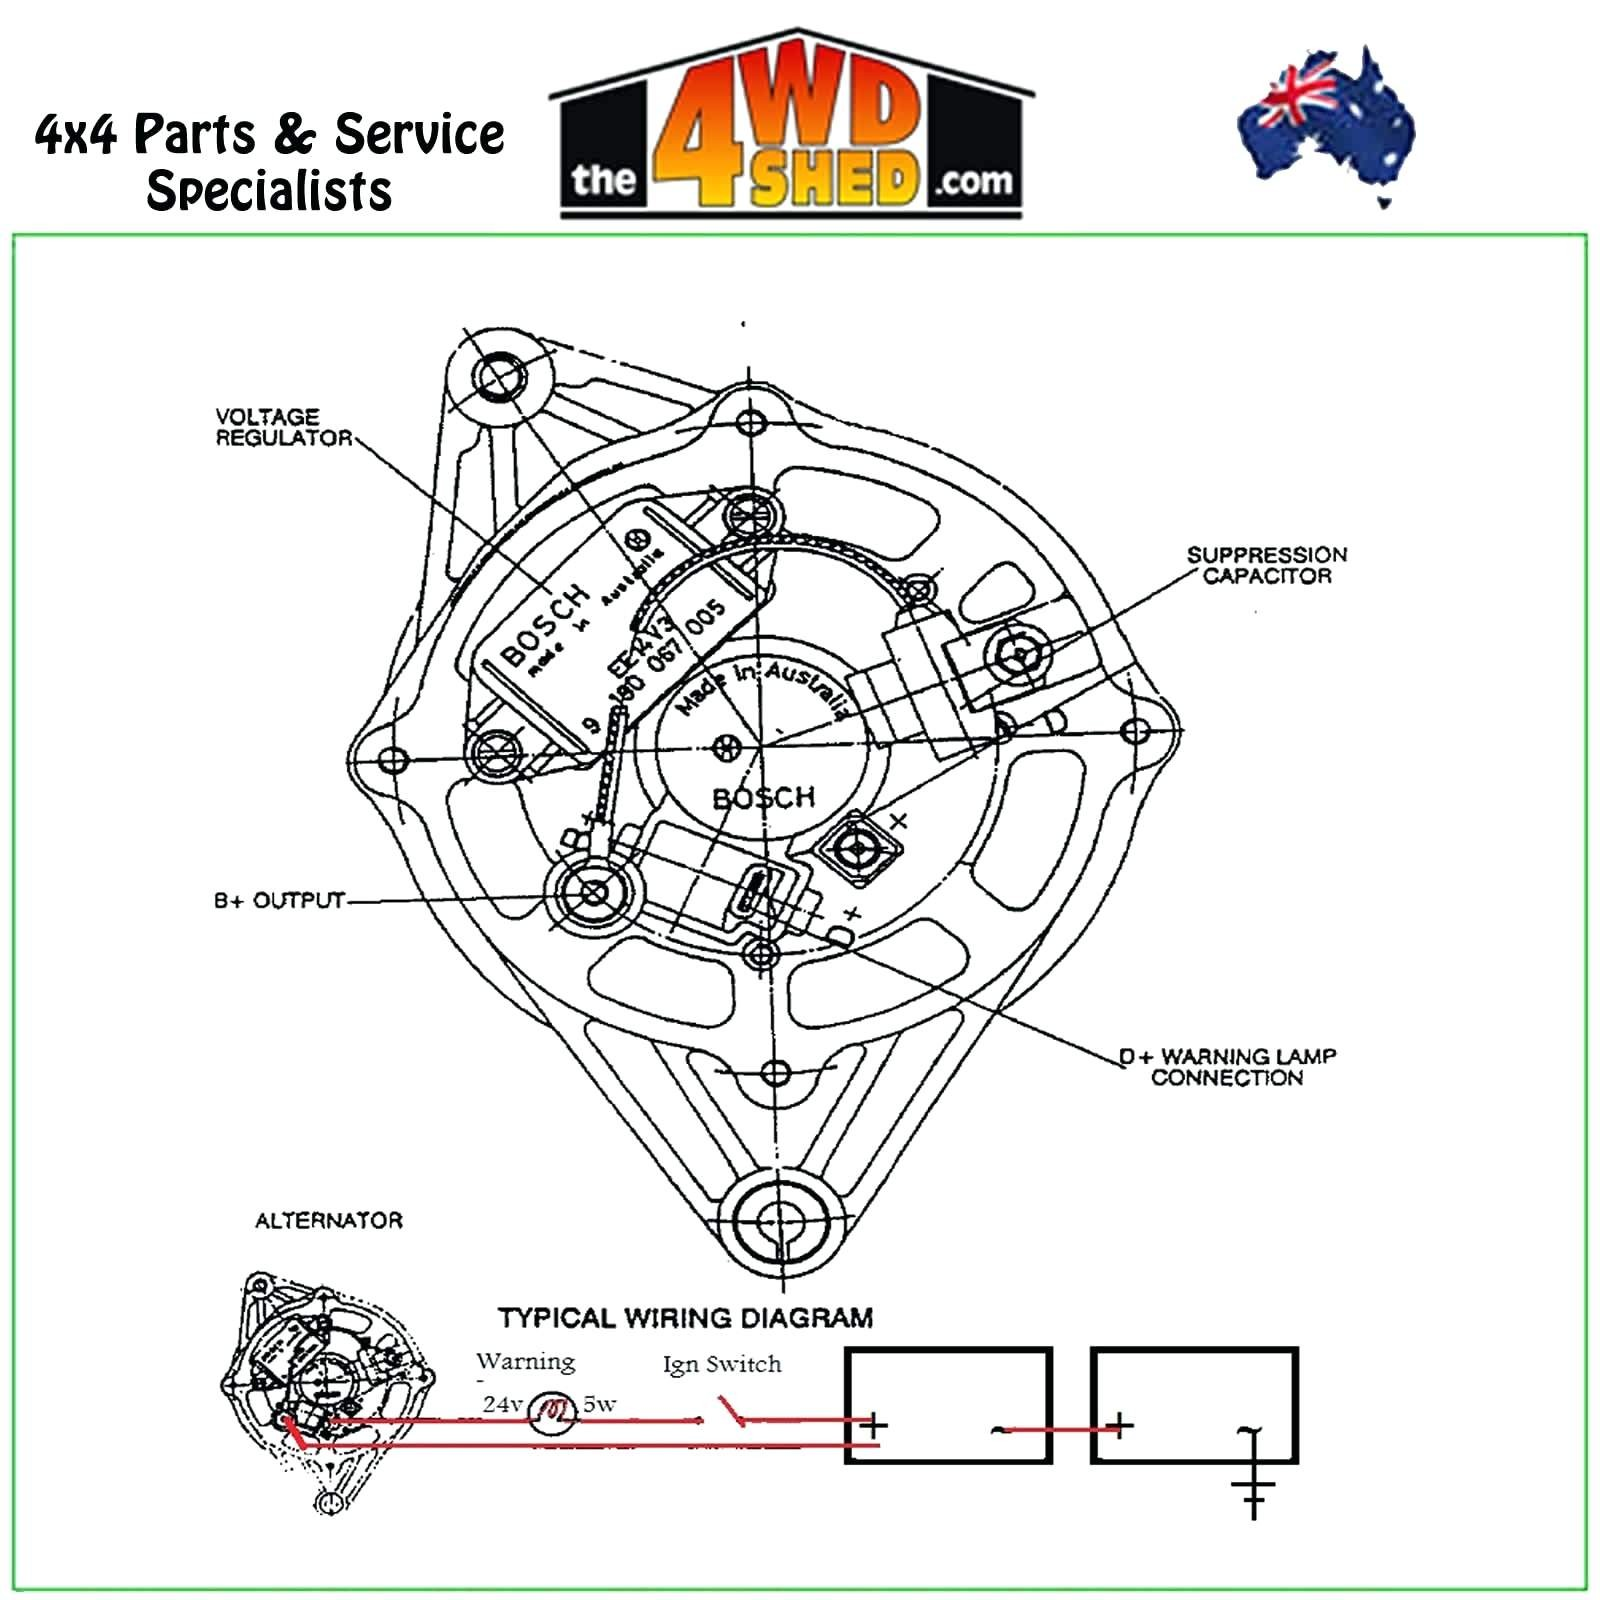 bosch alternator wiring diagram awesome wiring diagram imagedenso alternator wiring pig l solutions